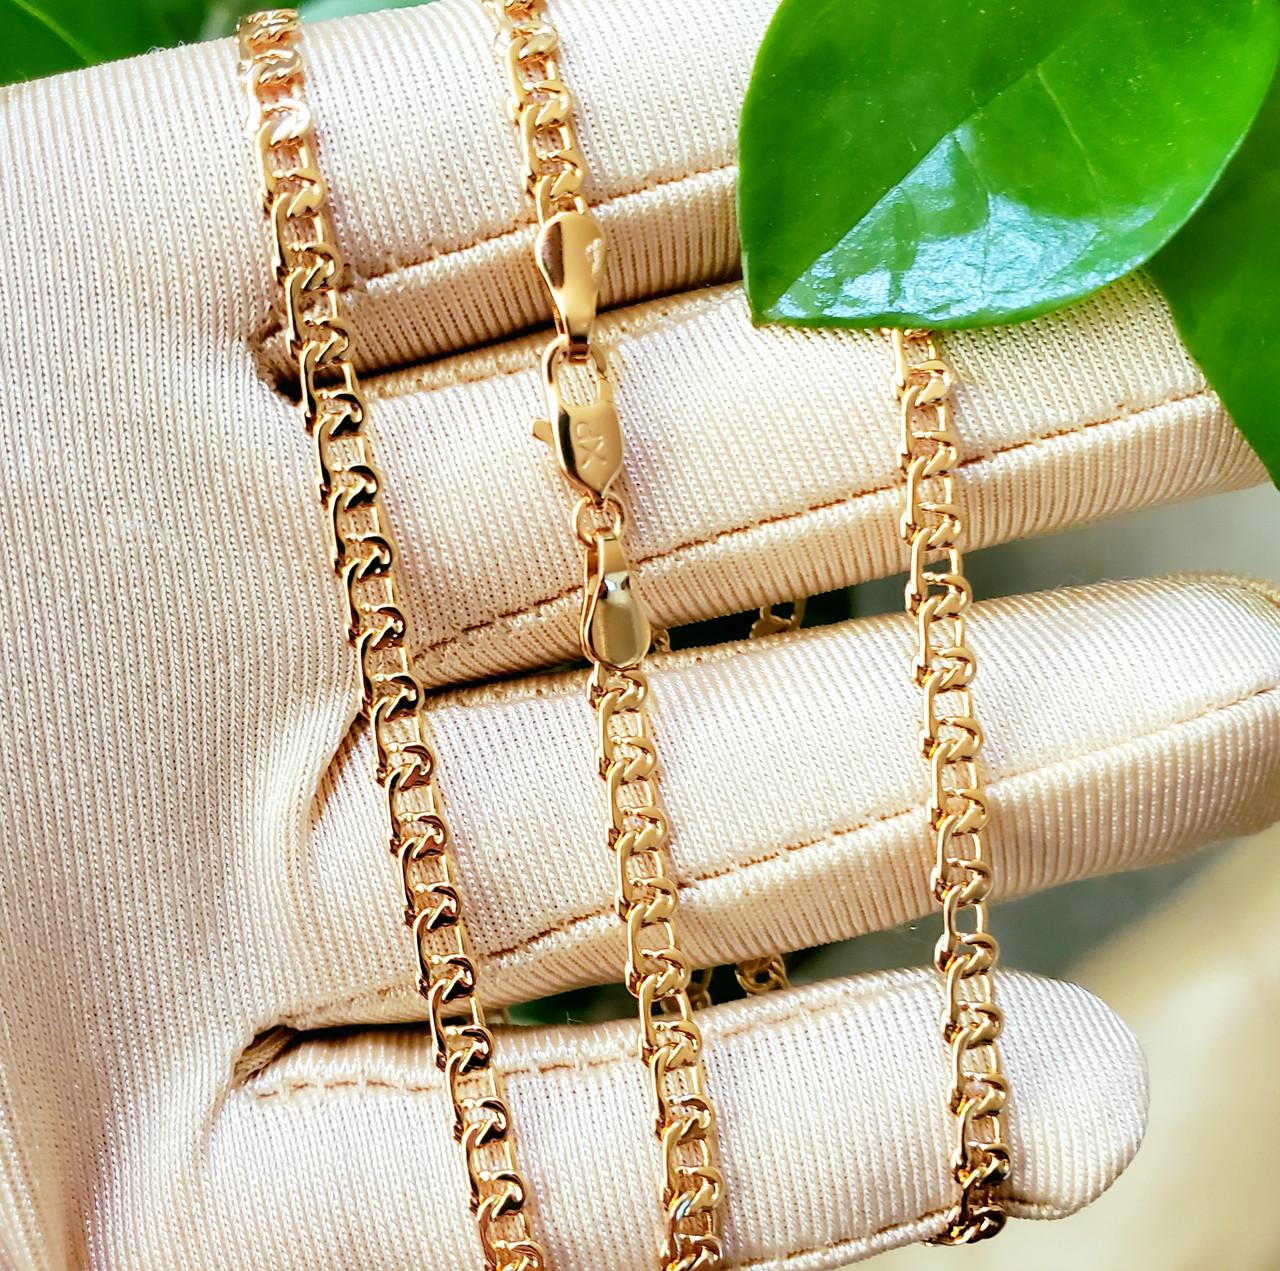 Ланцюжок xuping 3мм 45см медичне золото позолота 18К плетіння Муза ц734